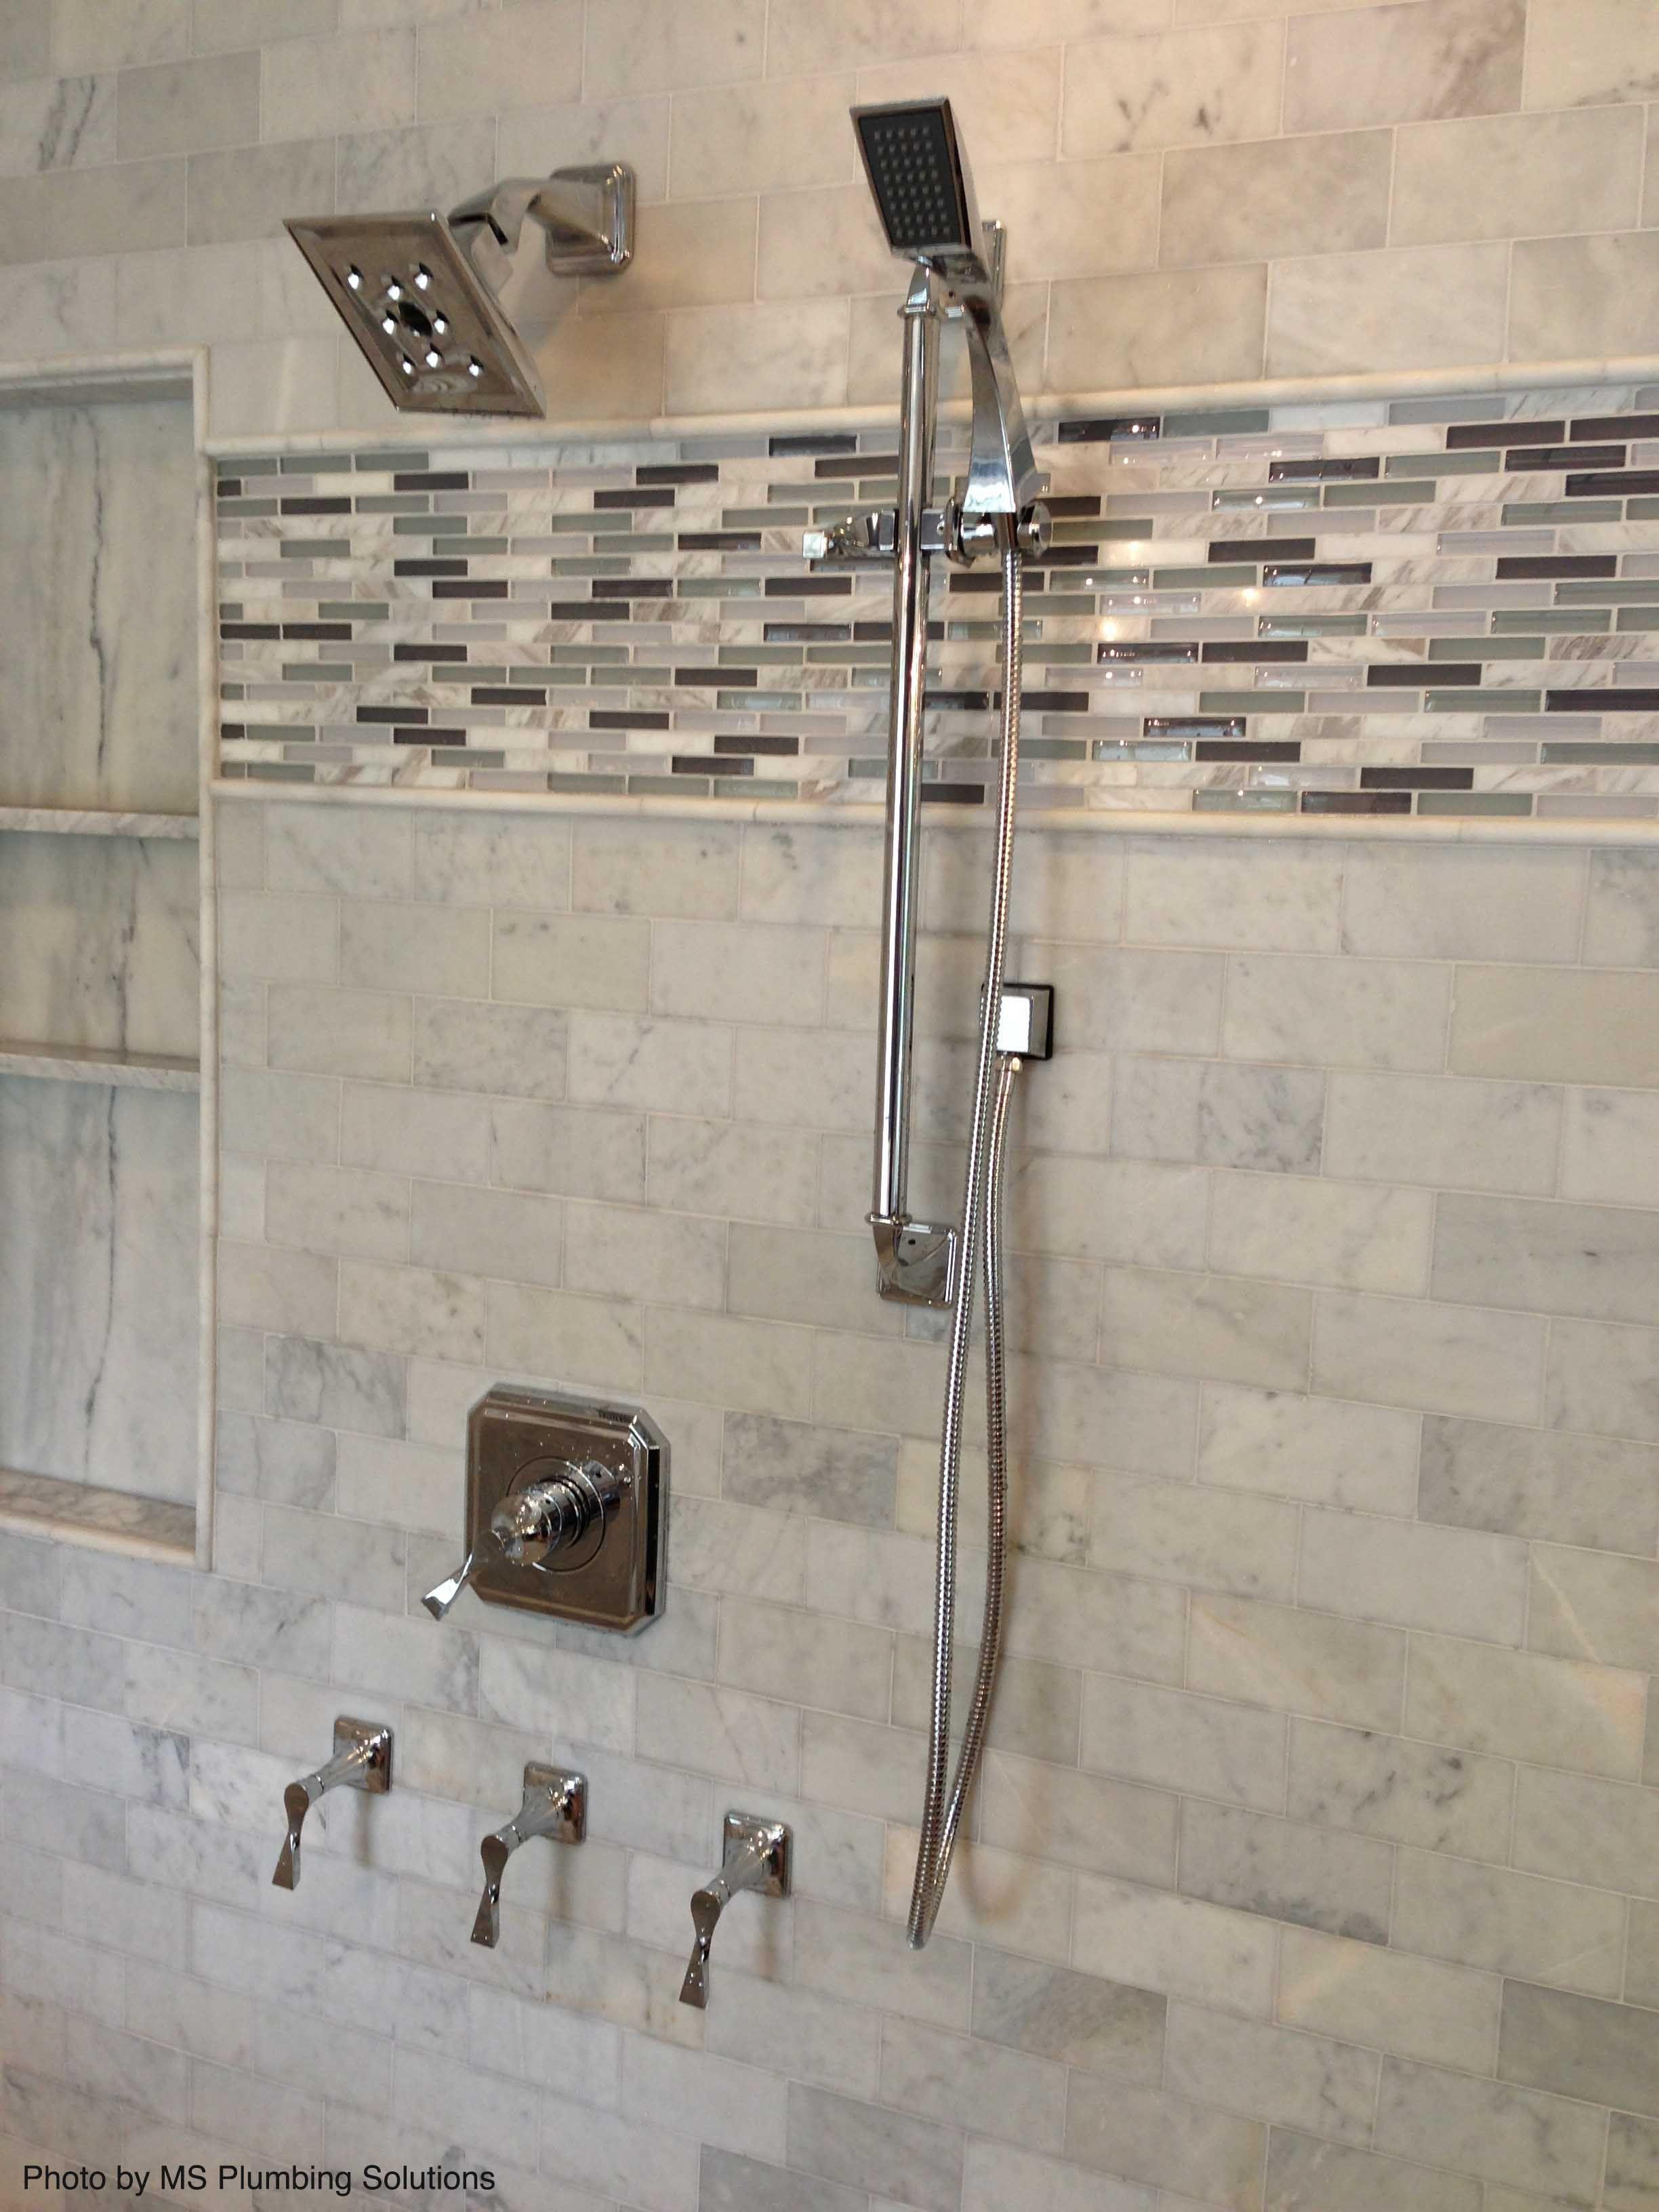 Bathroom Remodel Return On Investment Guide Bathrooms Remodel Bath Remodel Walk Through Shower